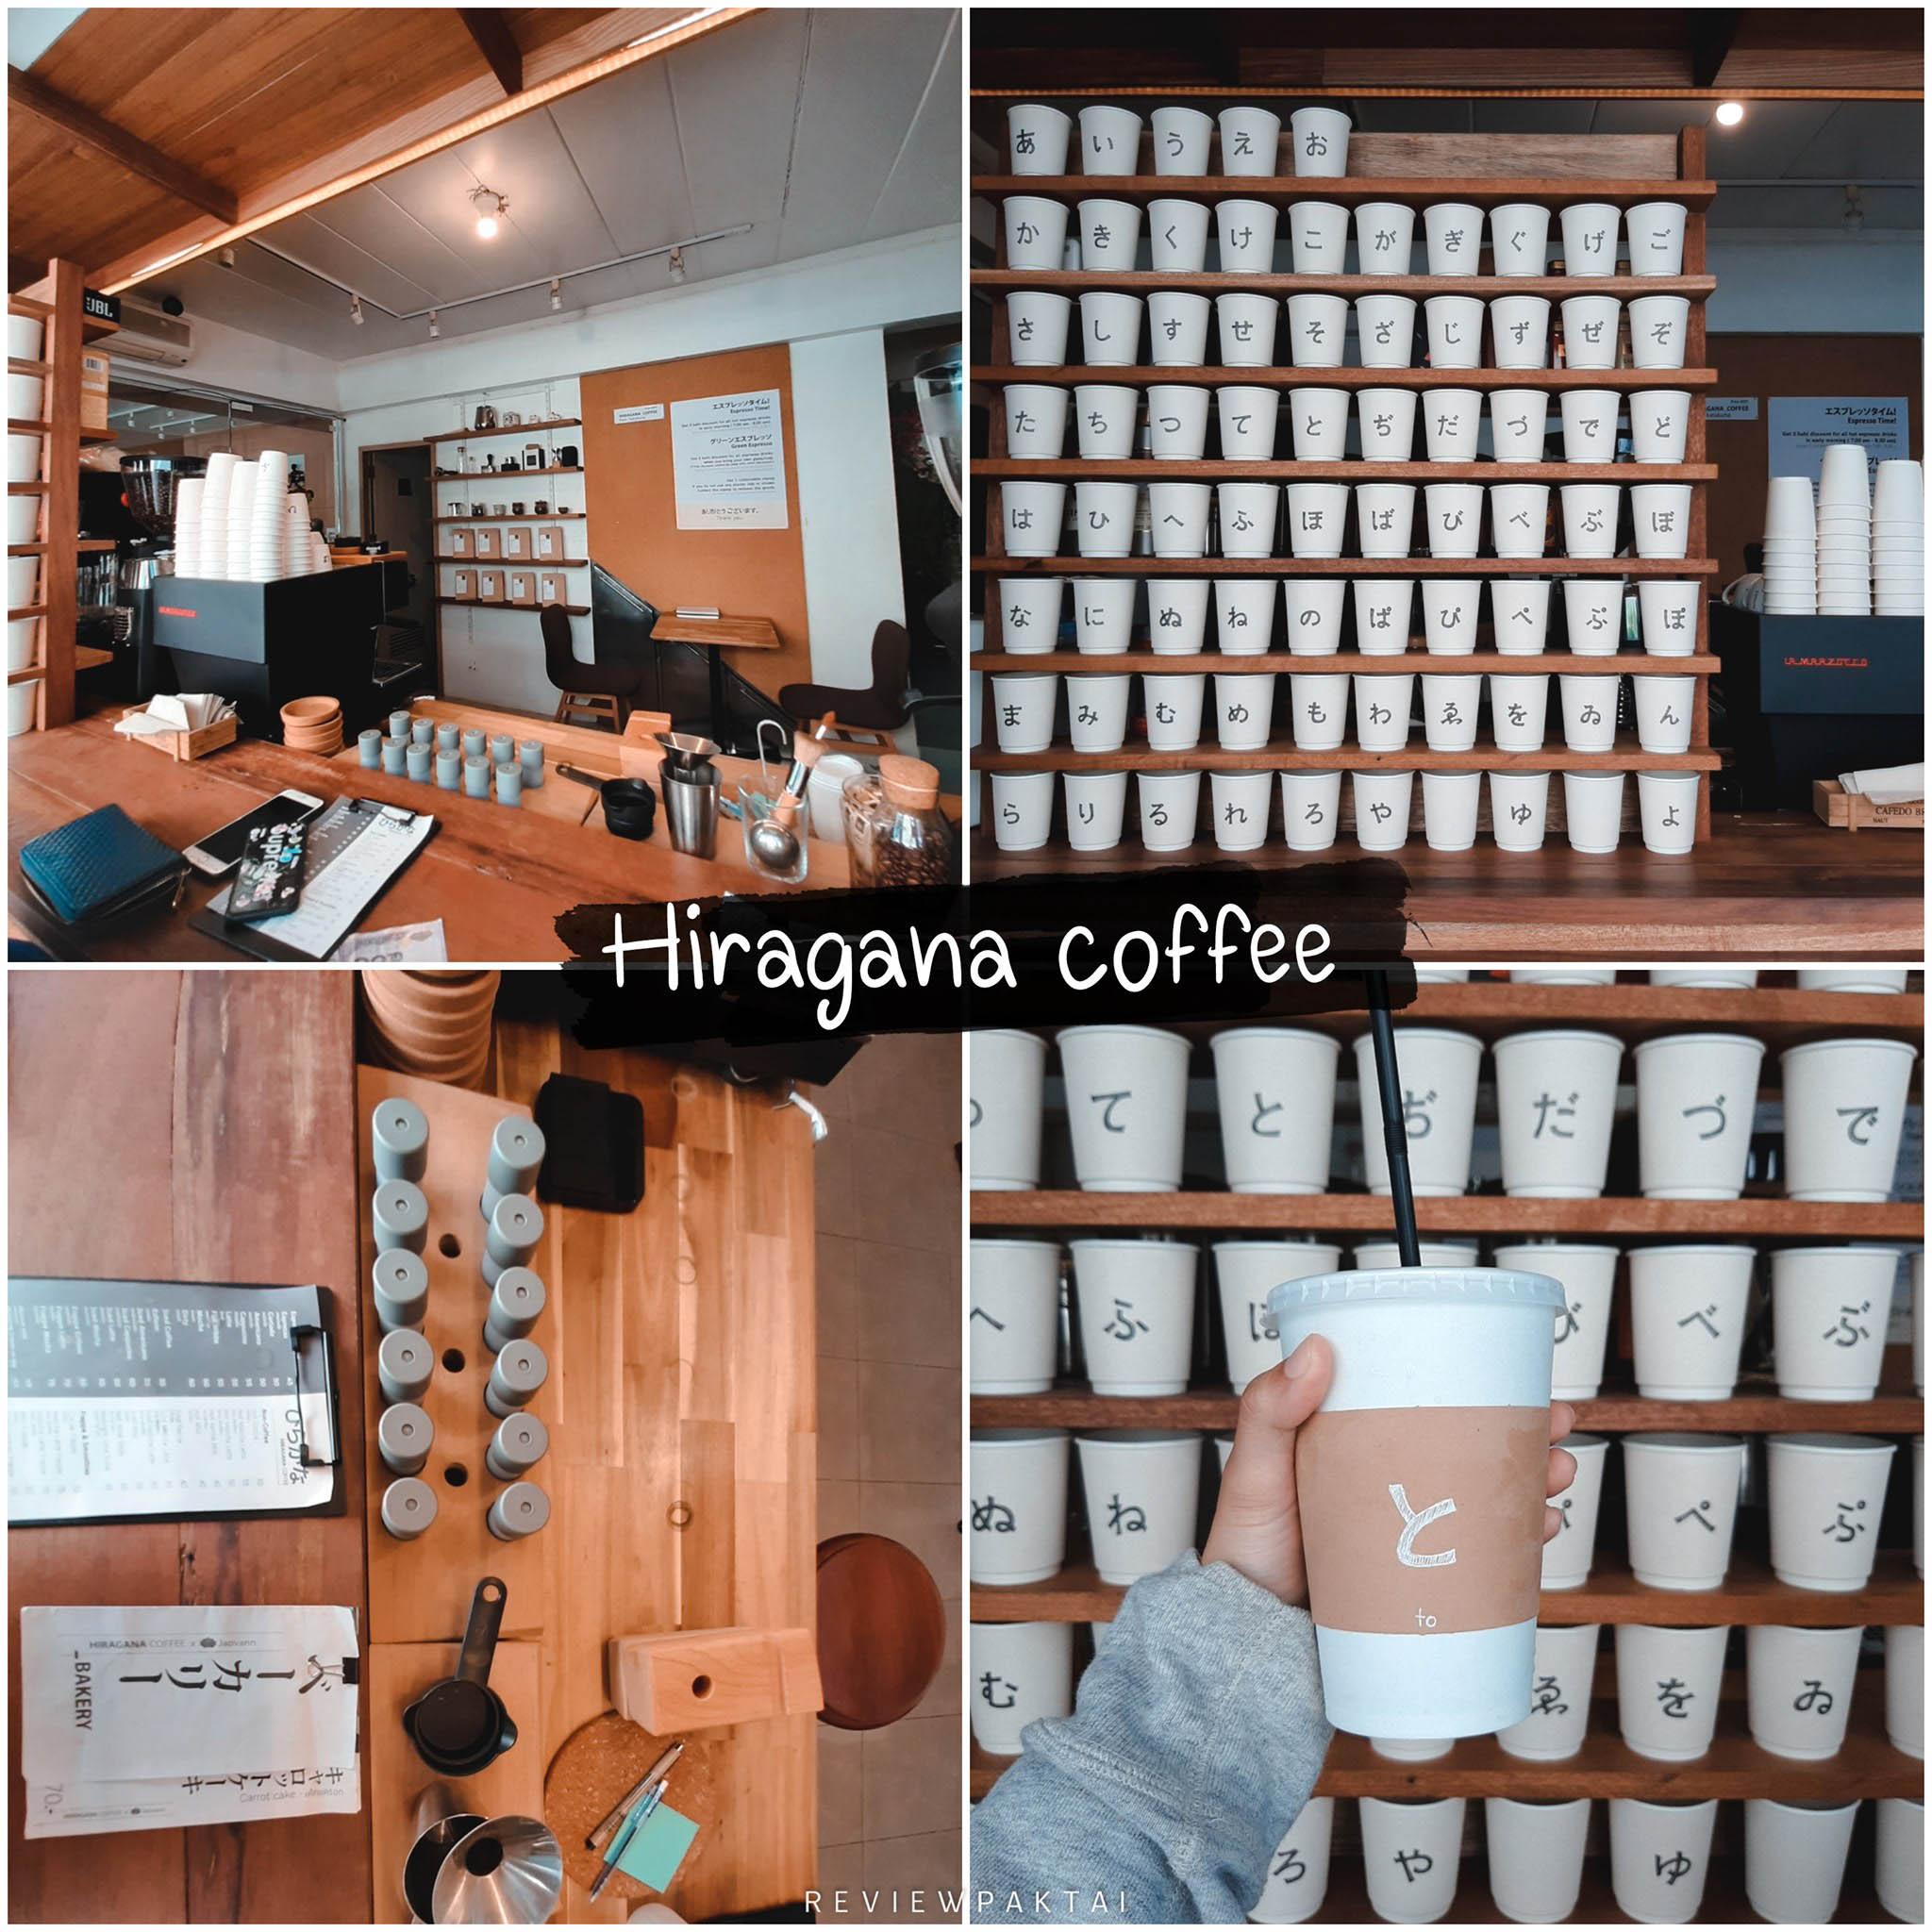 Hiragana-coffee คาเฟ่ภูเก็ต-ร้านน่ารัก-สไตล์ญี่ปุ่นมากๆ-ถึงจะเล็กแต่ก็ไม่ธรรมดามาถ่ายรูปสวยๆเช็คอินหลายมุมกันได้เลย ร้านแต่งได้น่ารักสไตล์ญี่ปุ่นมากๆ-แก้วเป็นรูปอักษรภาษาญี่ปุ่น-ถึงจะเล็กแต่ก็ไม่ธรรมดา-ถ่ายรูปสวยๆได้หลายมุม-เมนูของร้านก็มีทั้งเครื่องดื่มและเค้ก-ต้องบอกว่ารสชาติกับราคาไปด้วยกันได้อย่างดี-ที่ร้านมีเมล็ดกาแฟให้เลือกเป็นแบบคั่วกลางหรือคั่วเข้ม-ลาเต้ร้อนฟองนมนุ่ม-เครื่องดื่มราคาไม่แพงค่ะ-ถึงร้านละได้กลิ่นอายความเป็นญี่ปุ่นมาเลย-ตกแต่งร้านน่ารักมินิมอลสุดๆ-ทางร้านมีที่นั่งค่อนข้างน้อยนะคะ-เหมาะแก่การแวะซื้อทานบ้านค่ะ-หรืออาจจะแค่มาแชะรูปสักสองสามรูปสวยๆเช็คอิินปักหมุนแล้วกลับกันก็ได้เลยค่า-  ภูเก็ต,คาเฟ่,ที่เที่ยว,ร้านกาแฟ,เด็ด,อร่อย,ต้องลอง